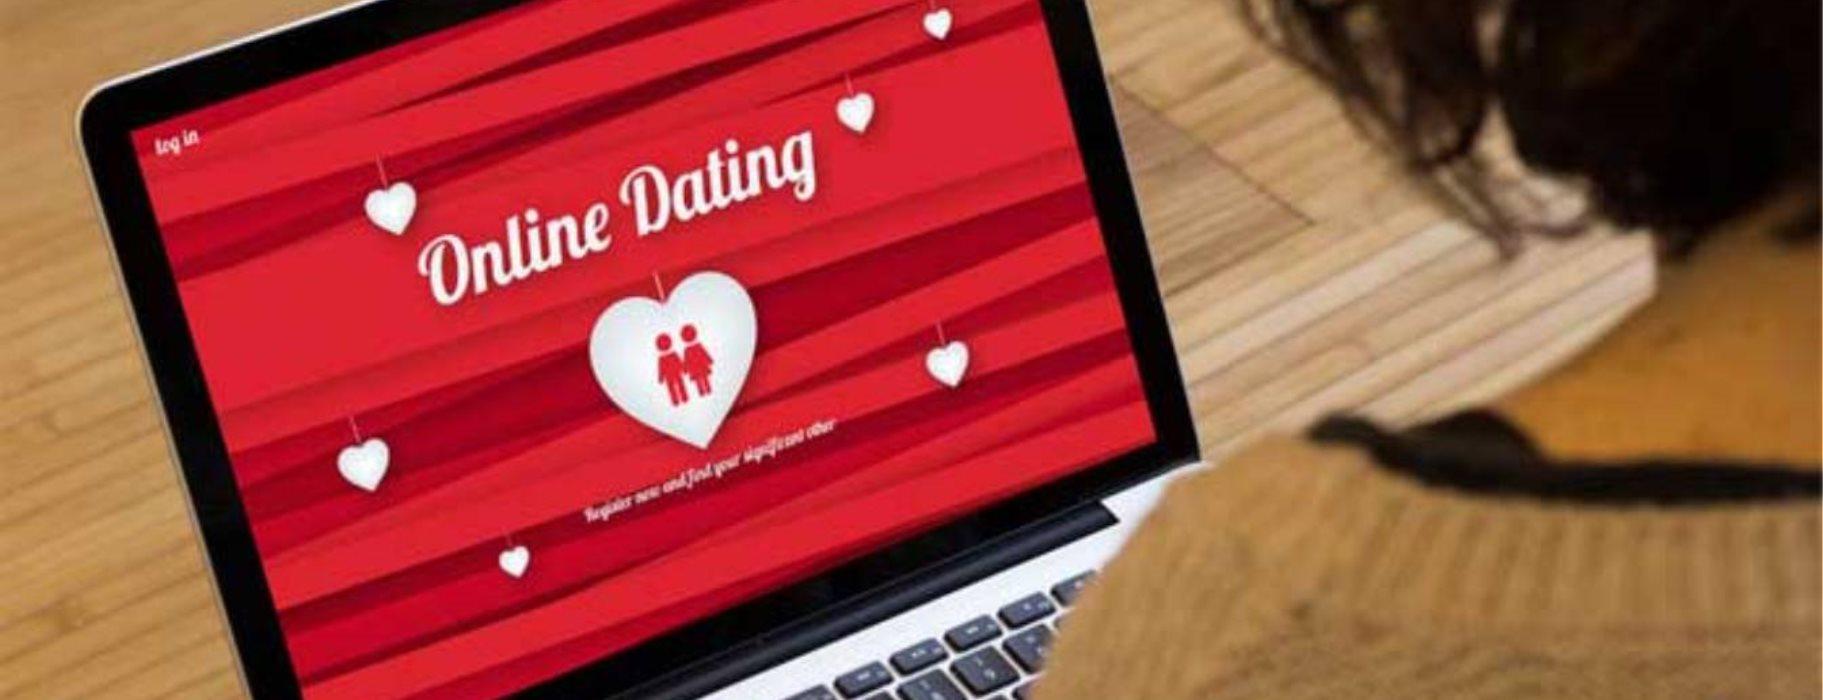 Dating εγγραφή αποραγισμένες συμβουλές γνωριμιών